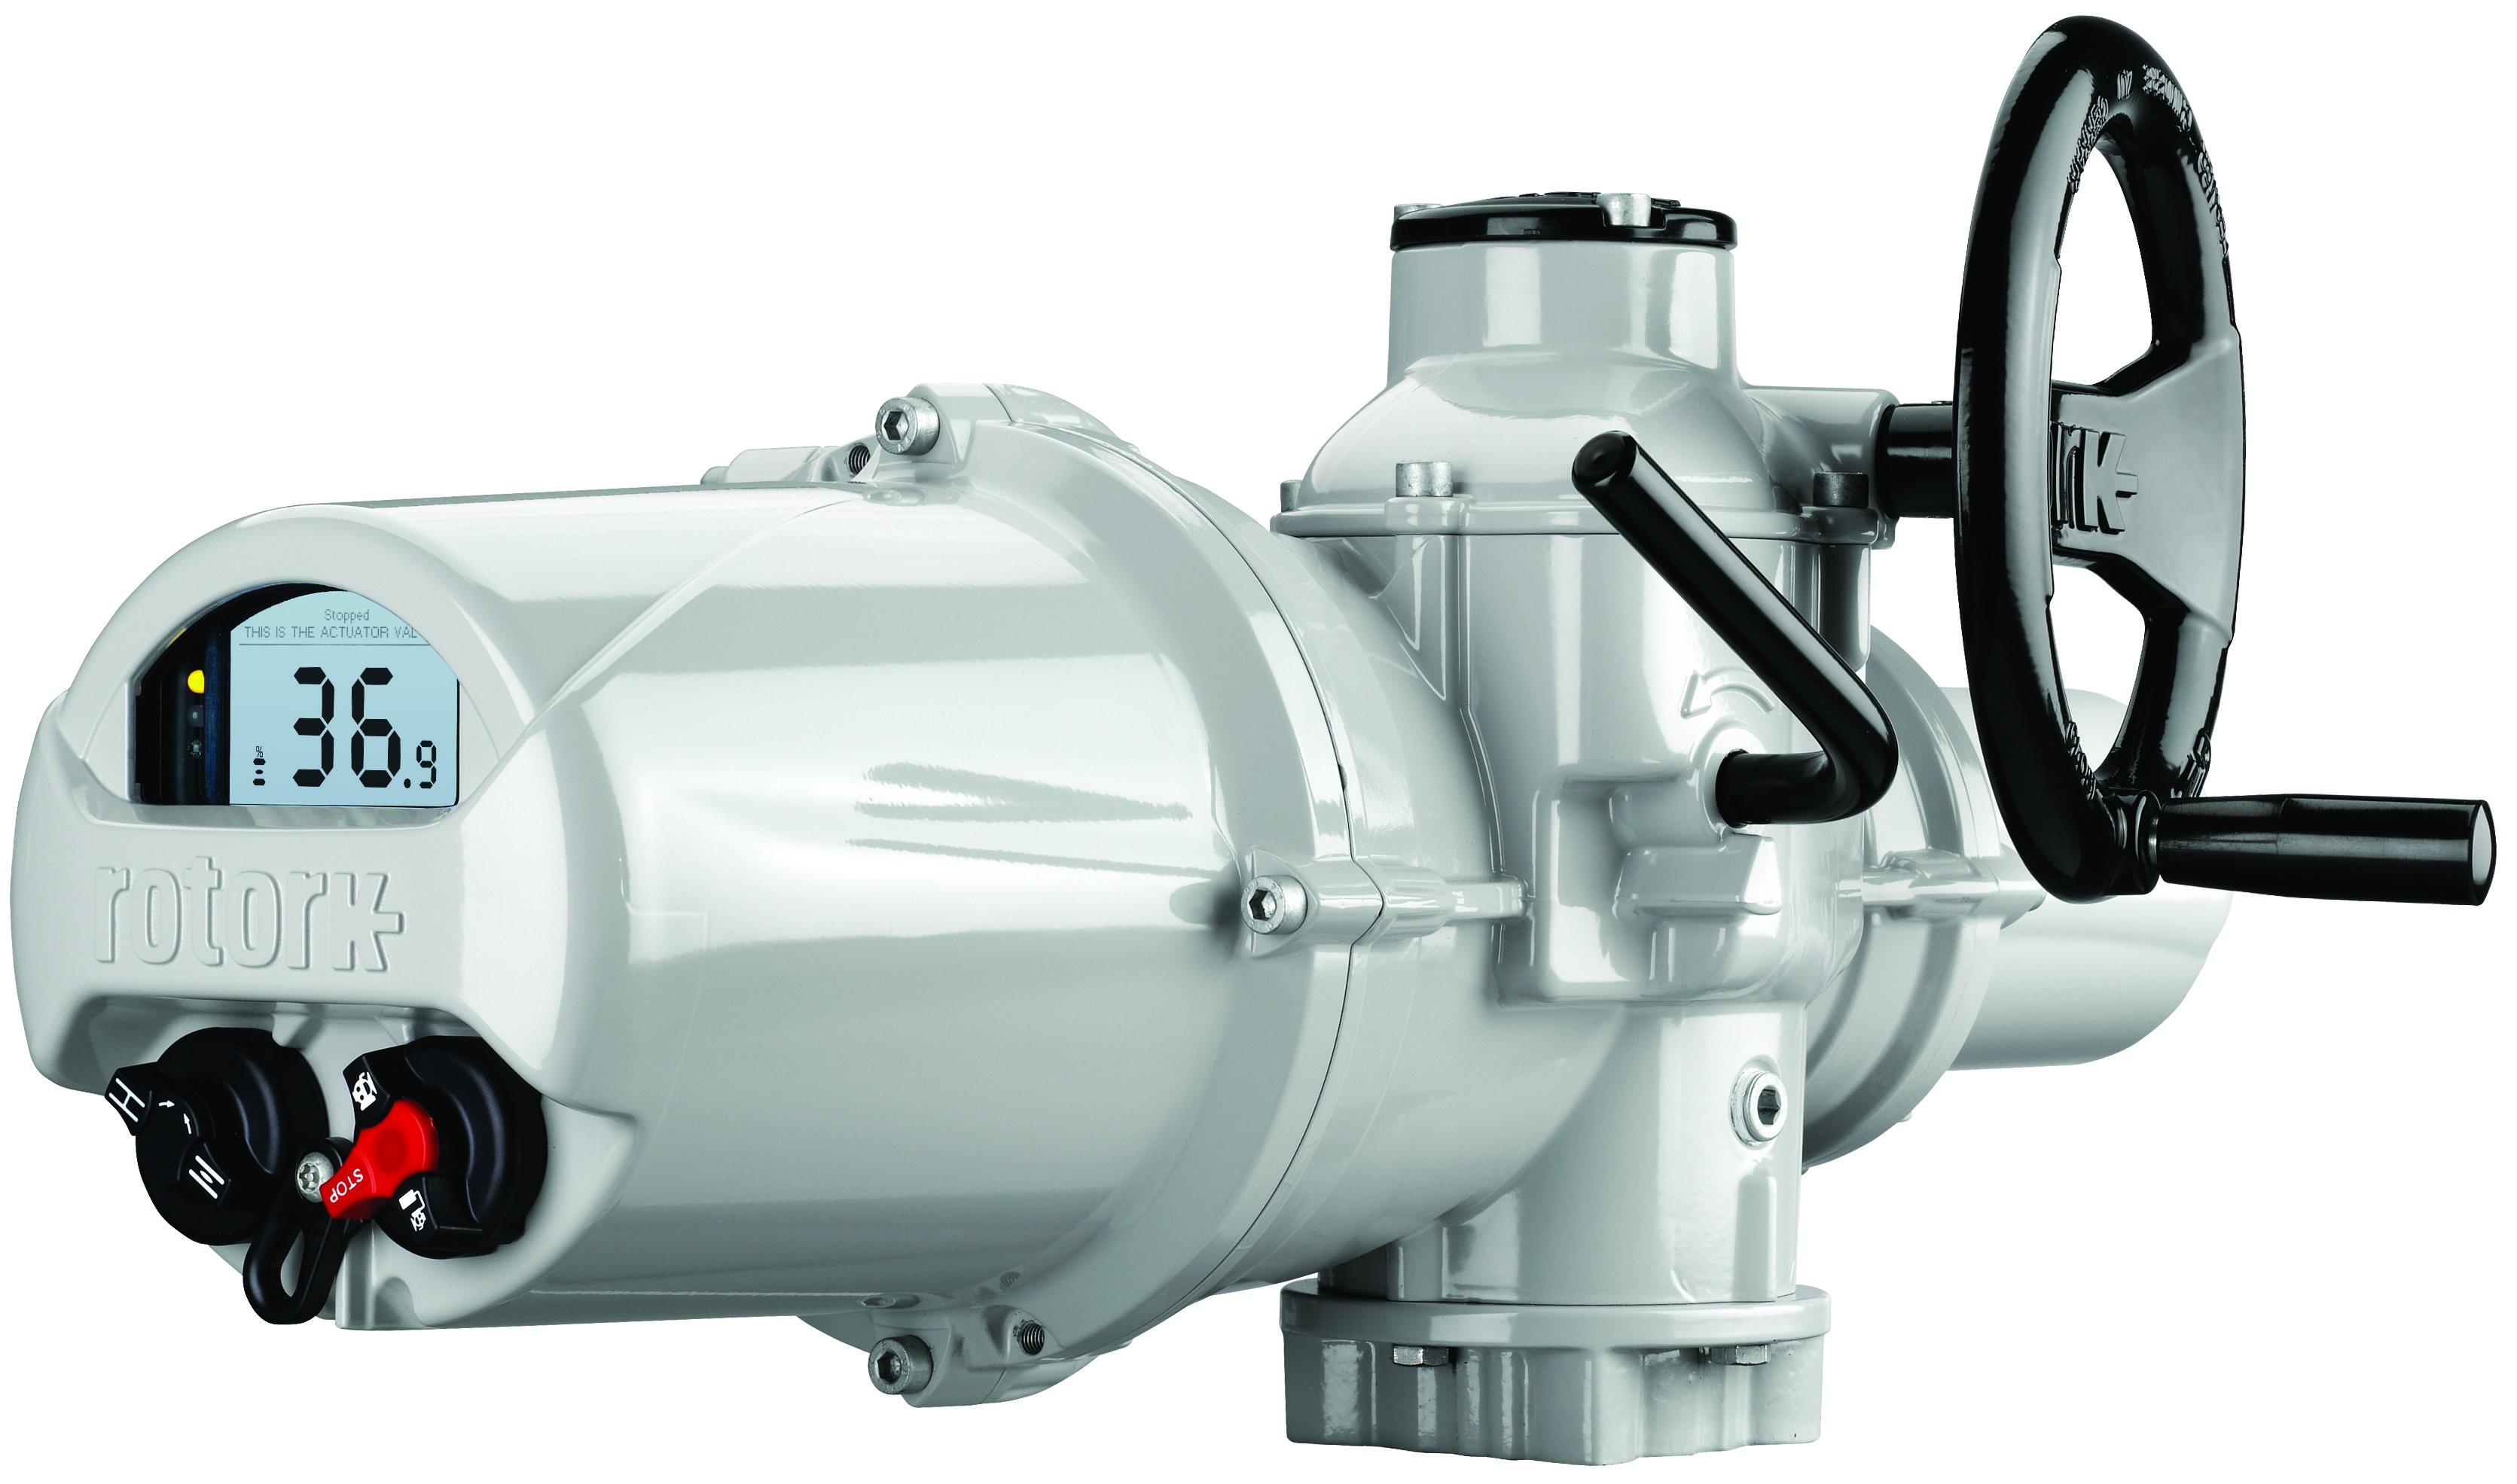 Rotork | Precision Pipeline Equipment, Inc